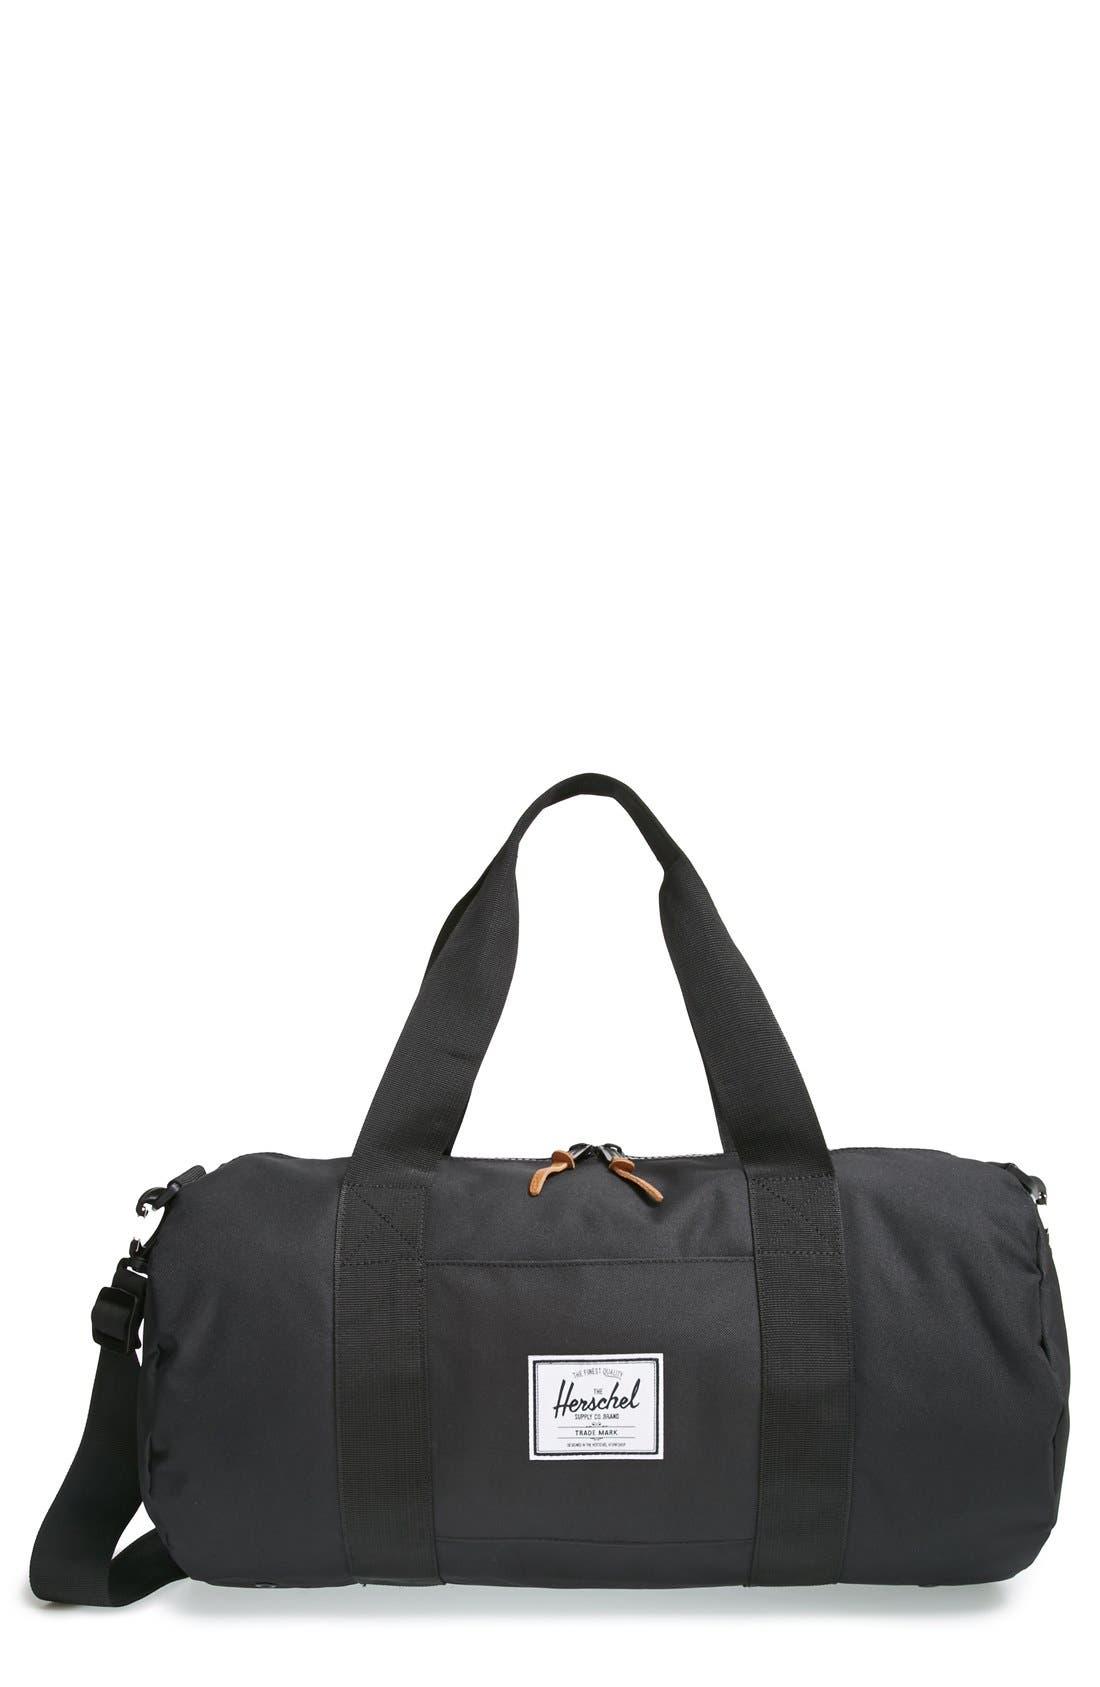 Alternate Image 1 Selected - Herschel Supply Co. 'Sutton - Mid Volume' Duffel Bag